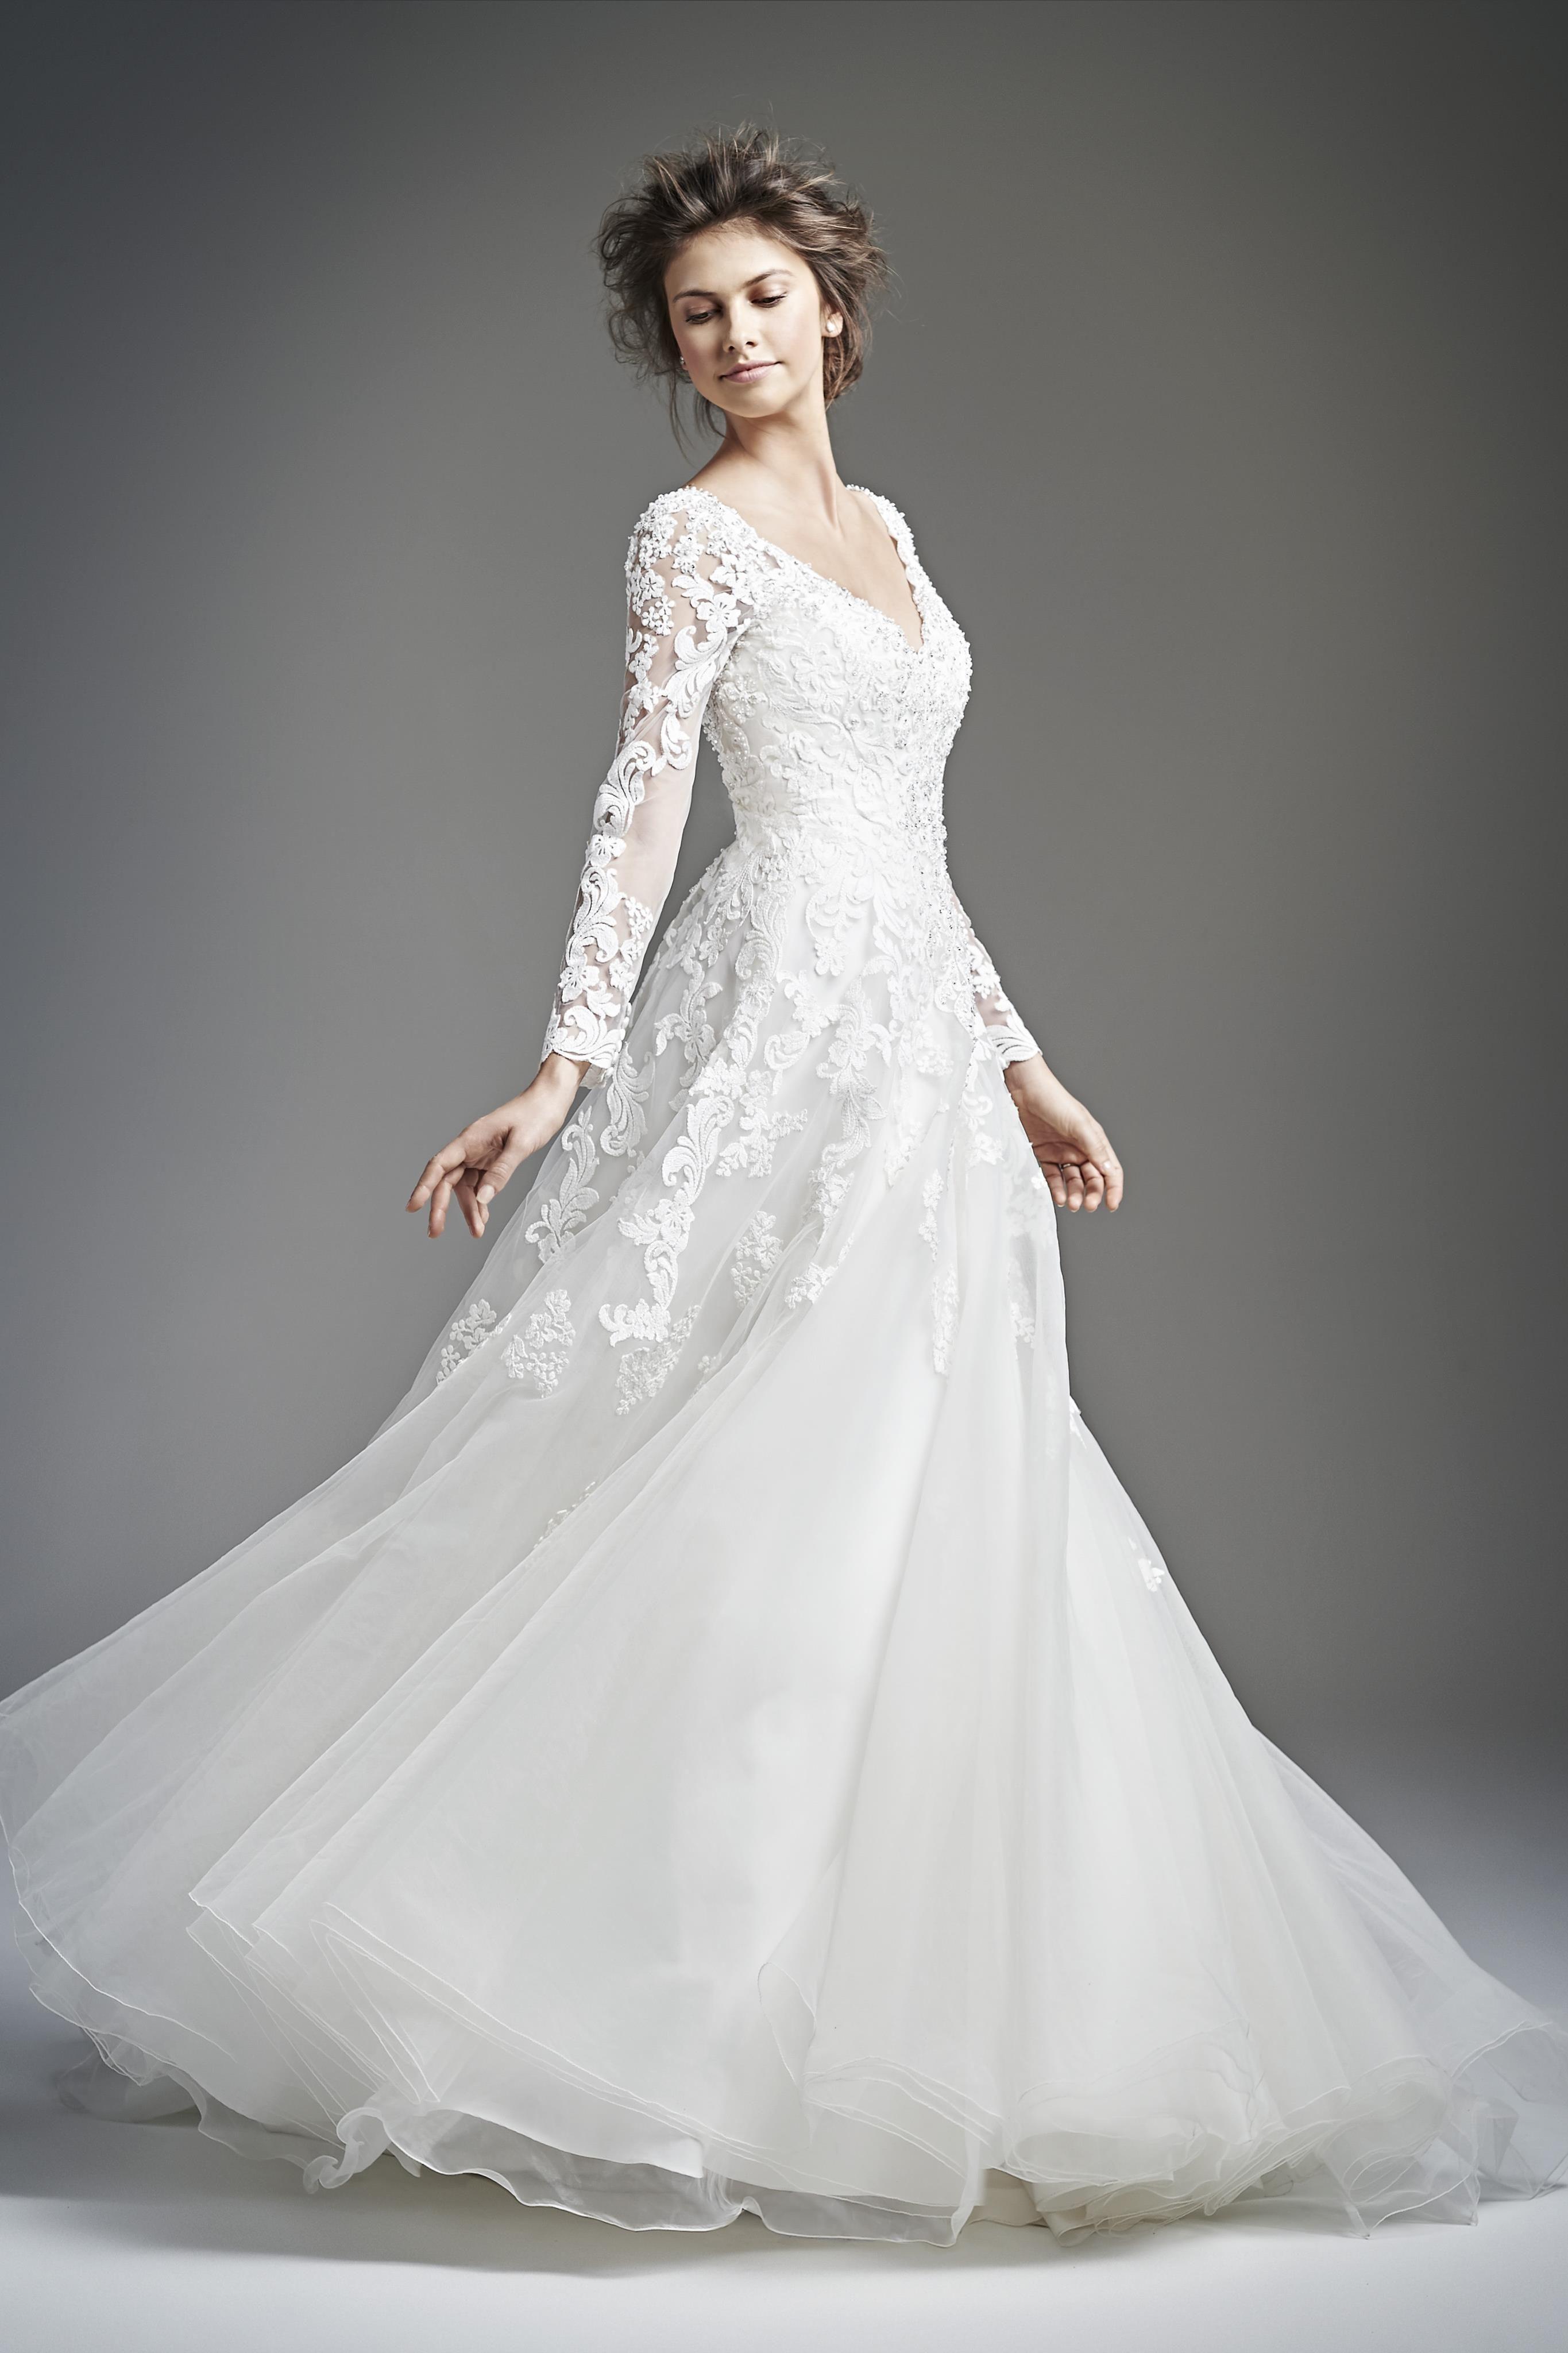 Pin by sophie jones on wedding dress pinterest wedding dress and